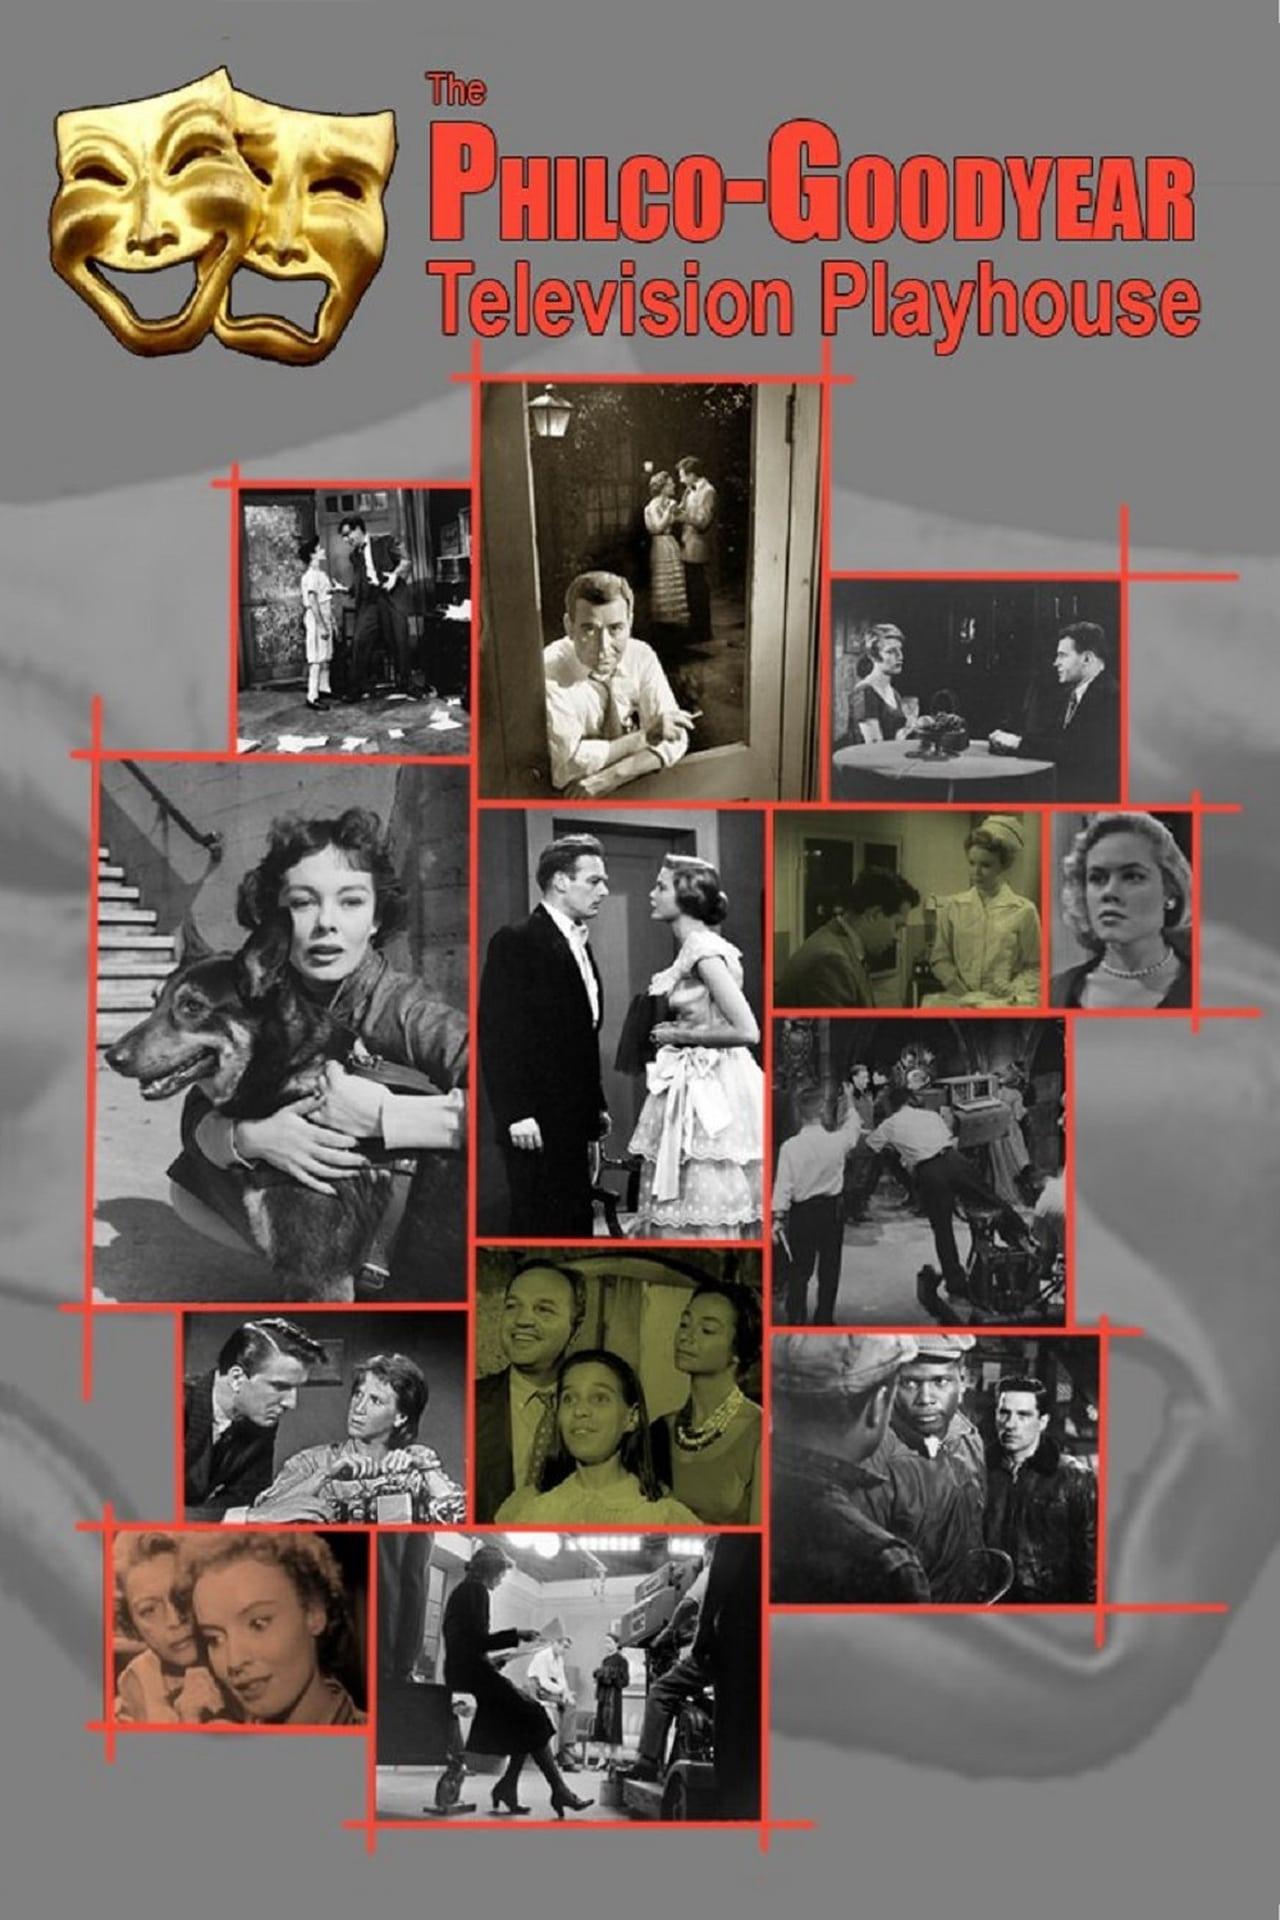 Goodyear Television Playhouse